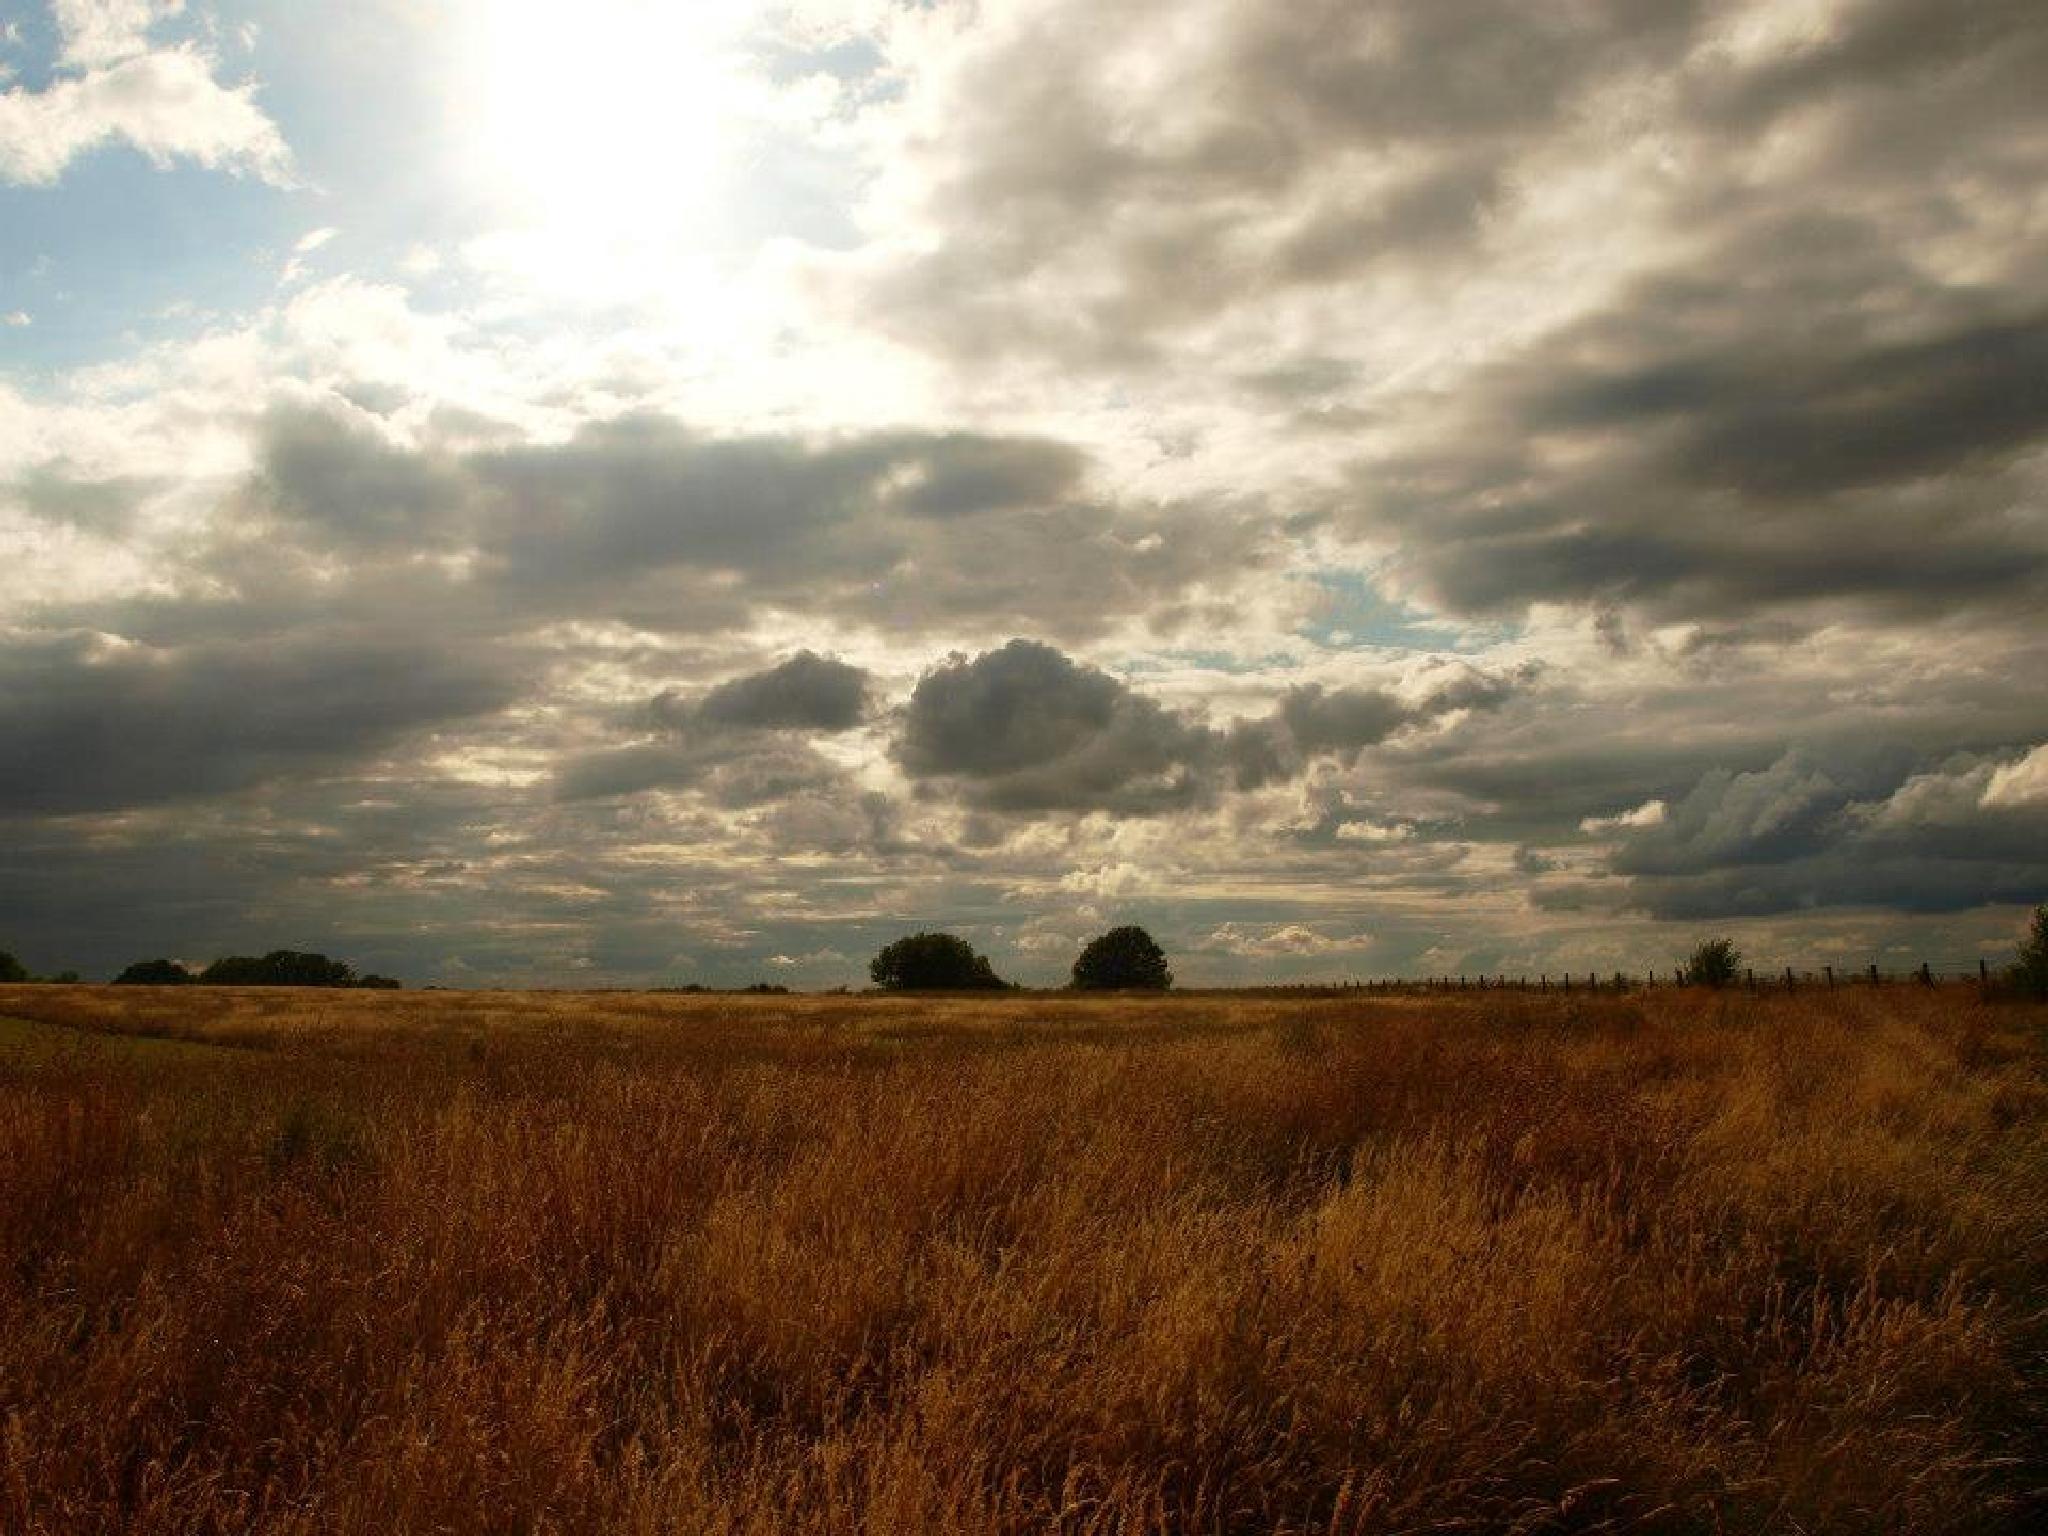 Grass on landscape by sahrsorie